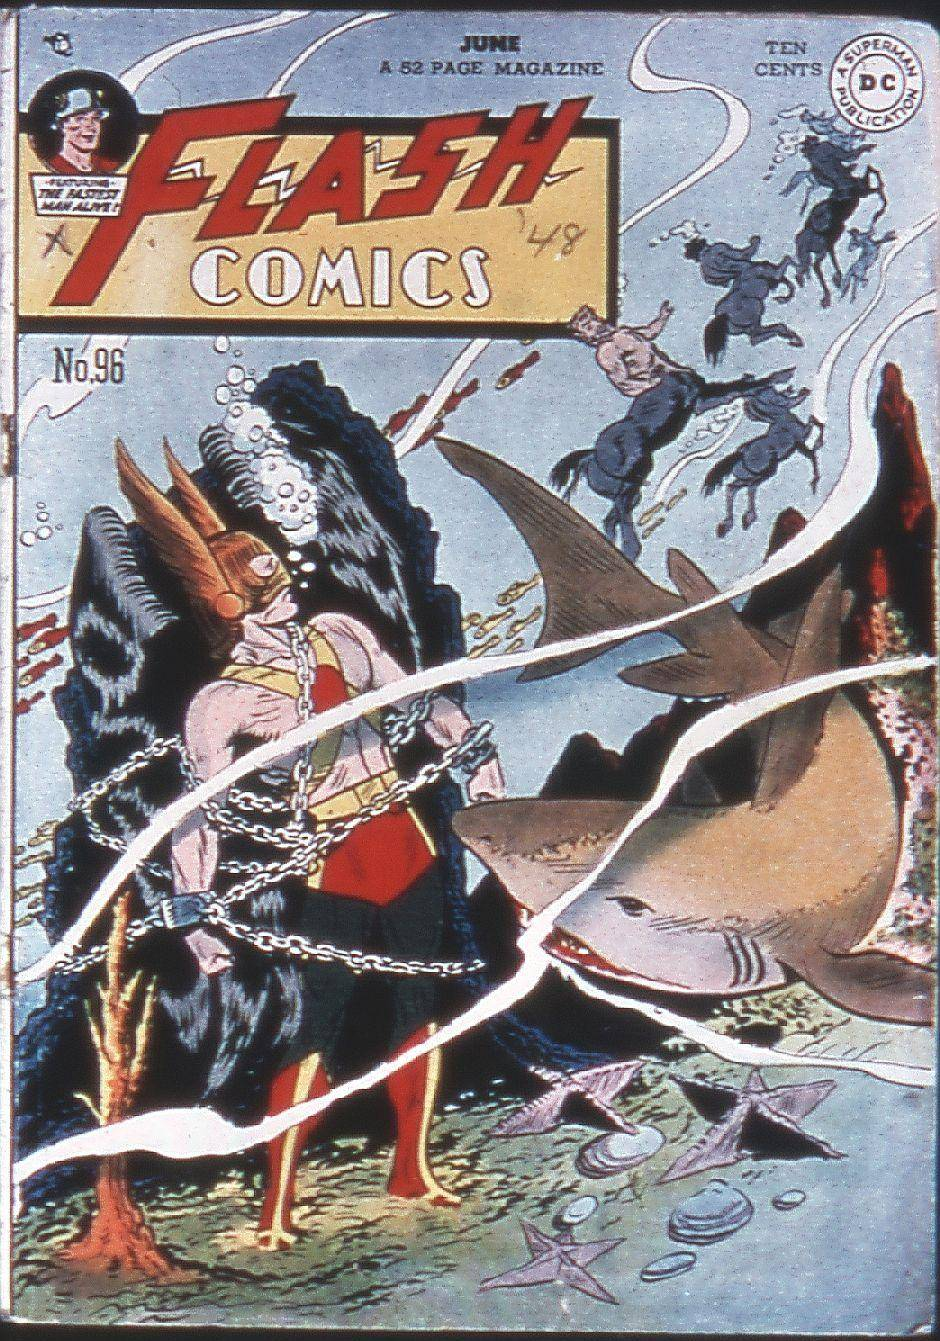 Flash Comics [1948-06] 096 fiche